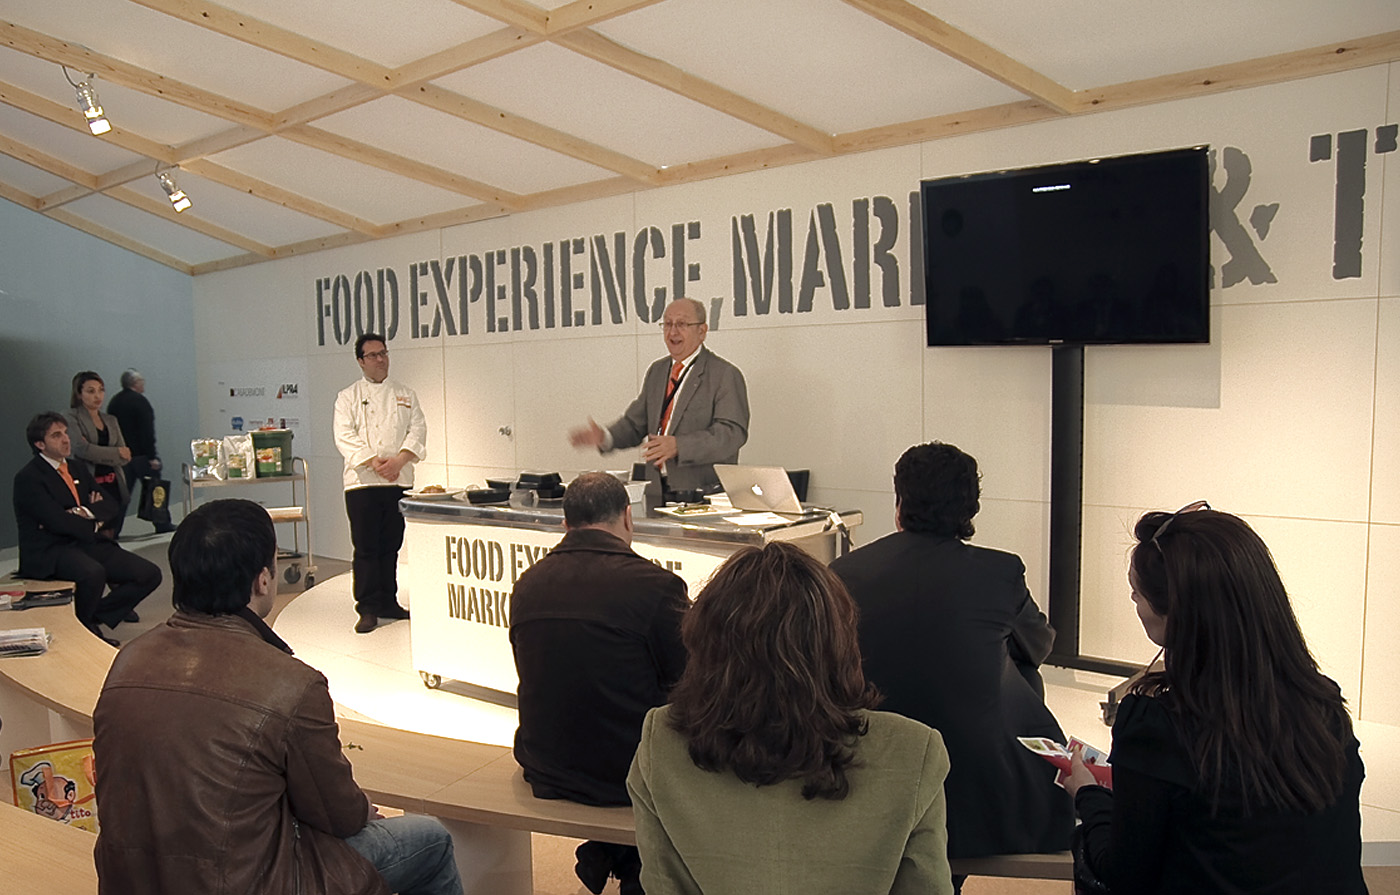 foodexperience-alimentaria-creartiva-evento-stand-feria-expositor